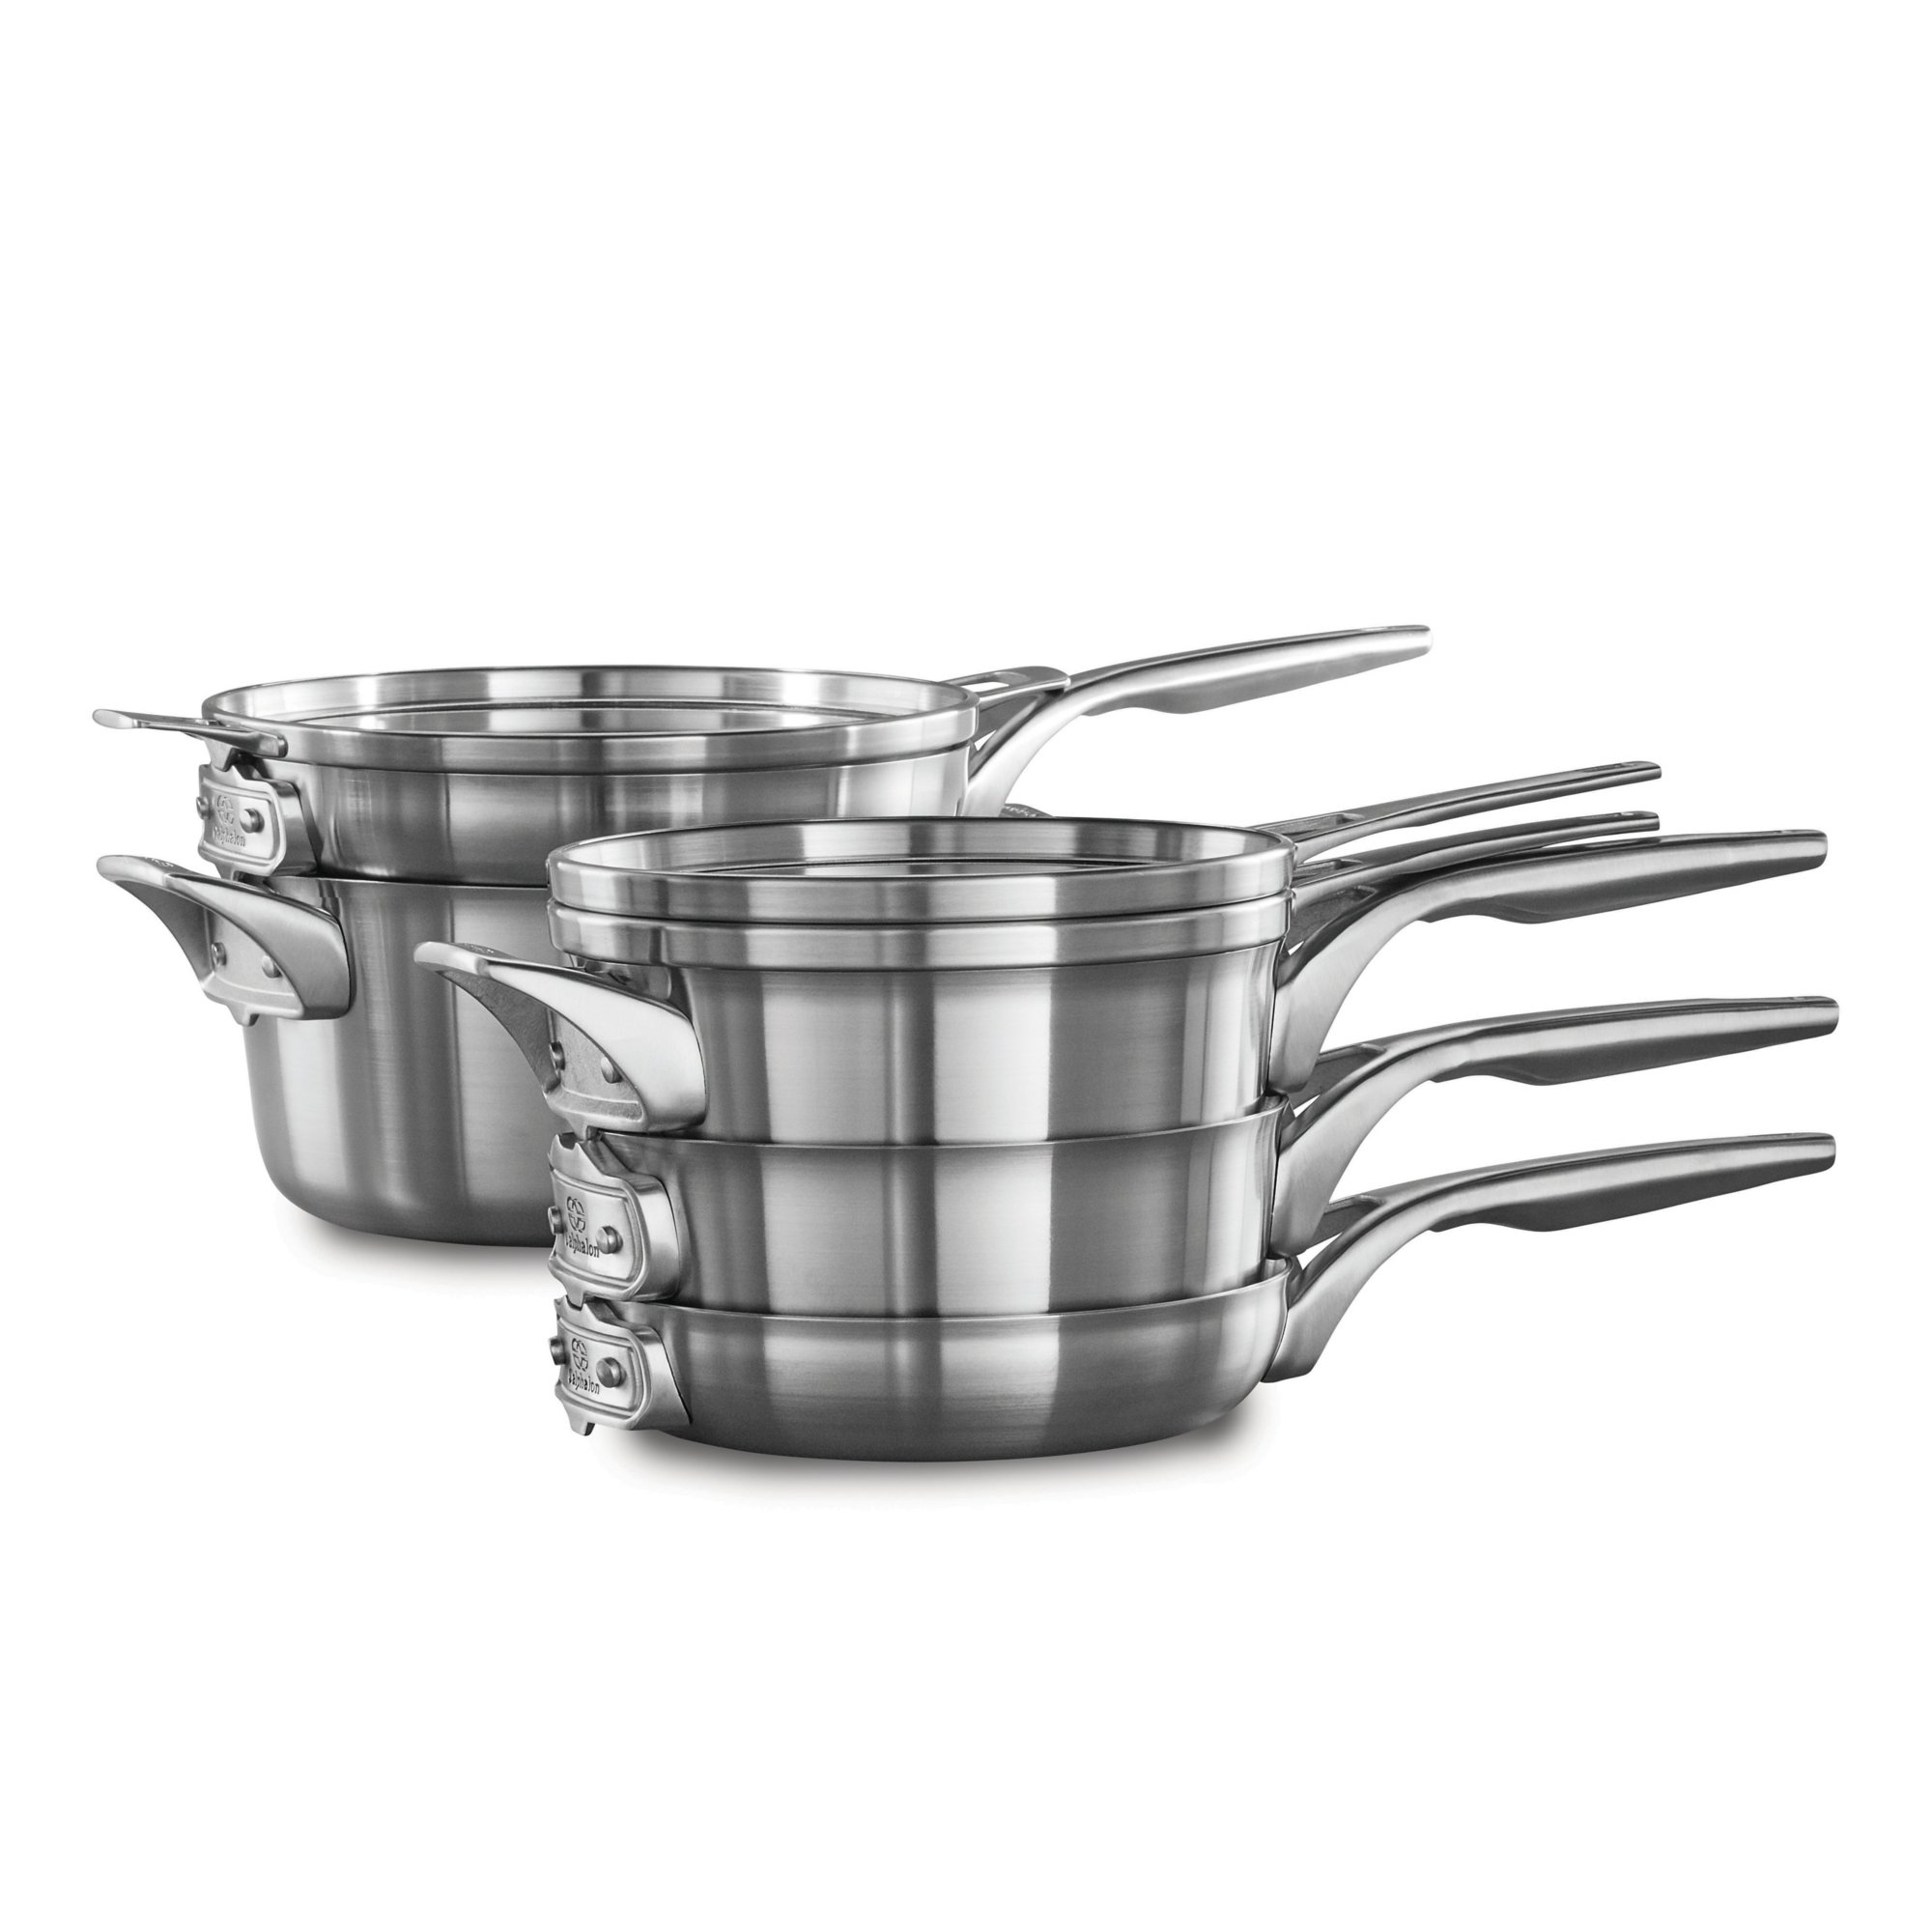 Calphalon Premier? Space Saving Stainless Steel 8-Piece Cookware Set